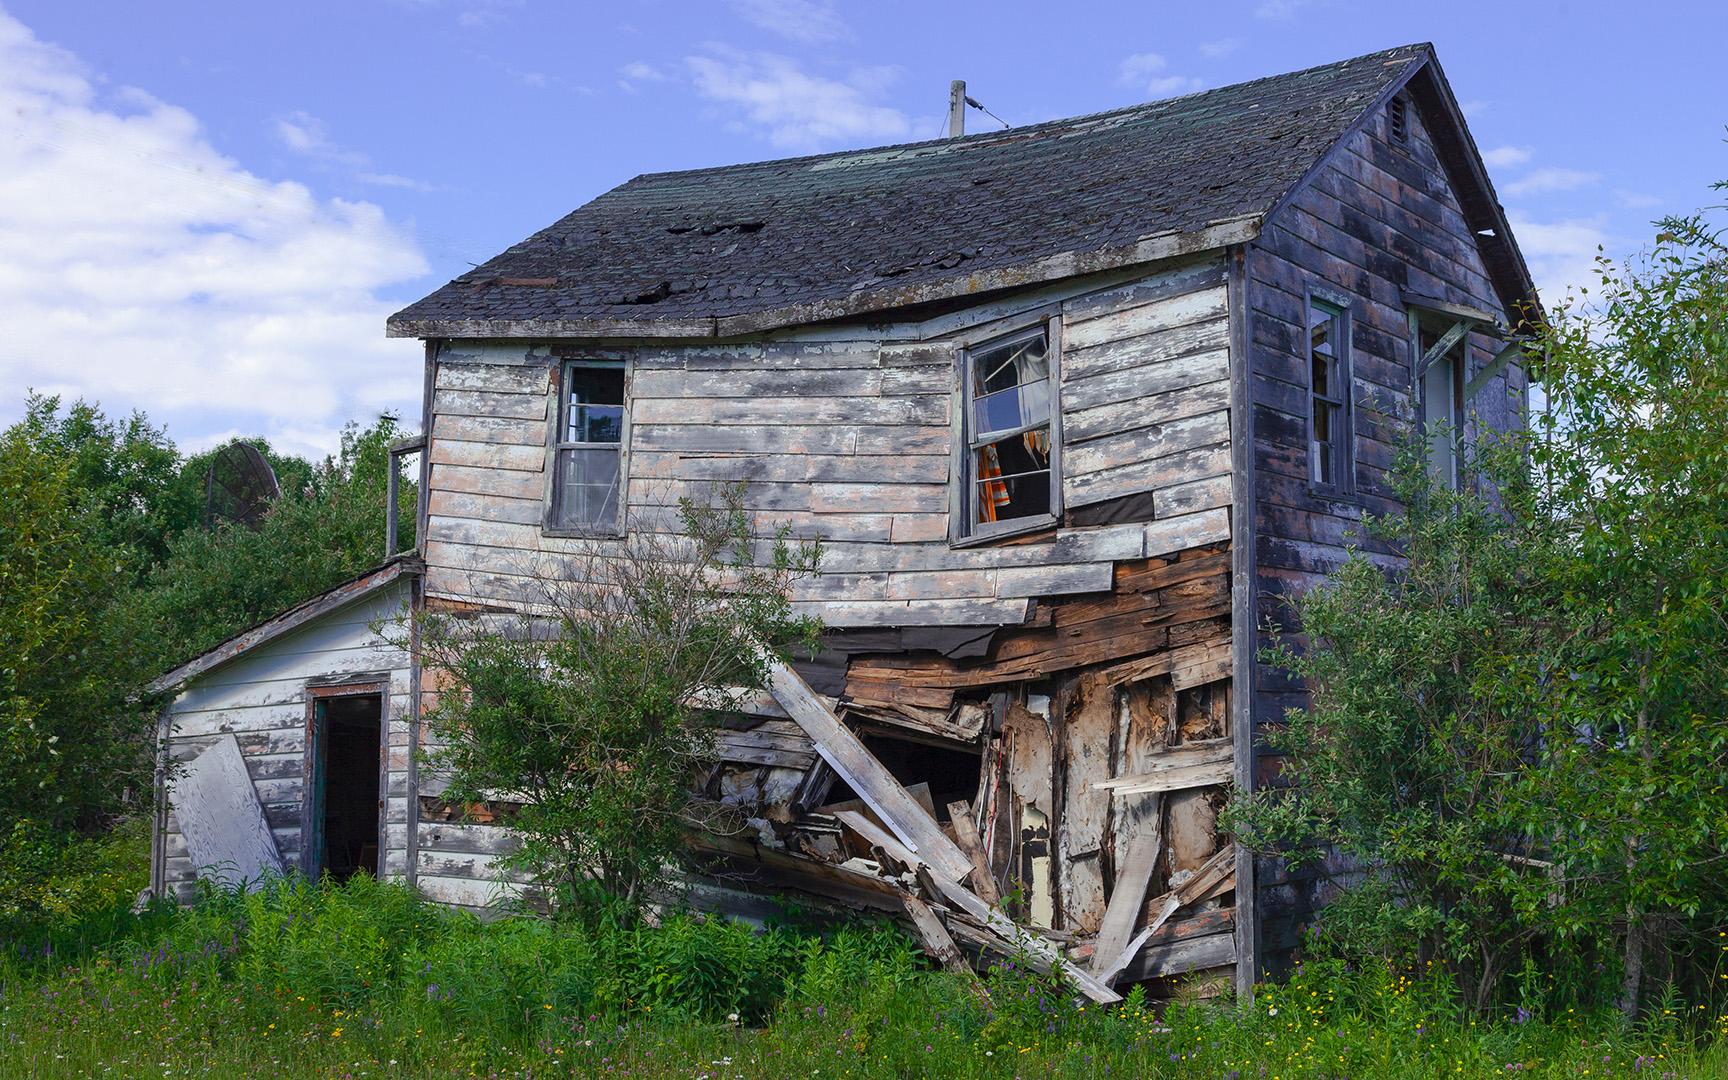 Hilary Ottley – Abandoned – 3RD